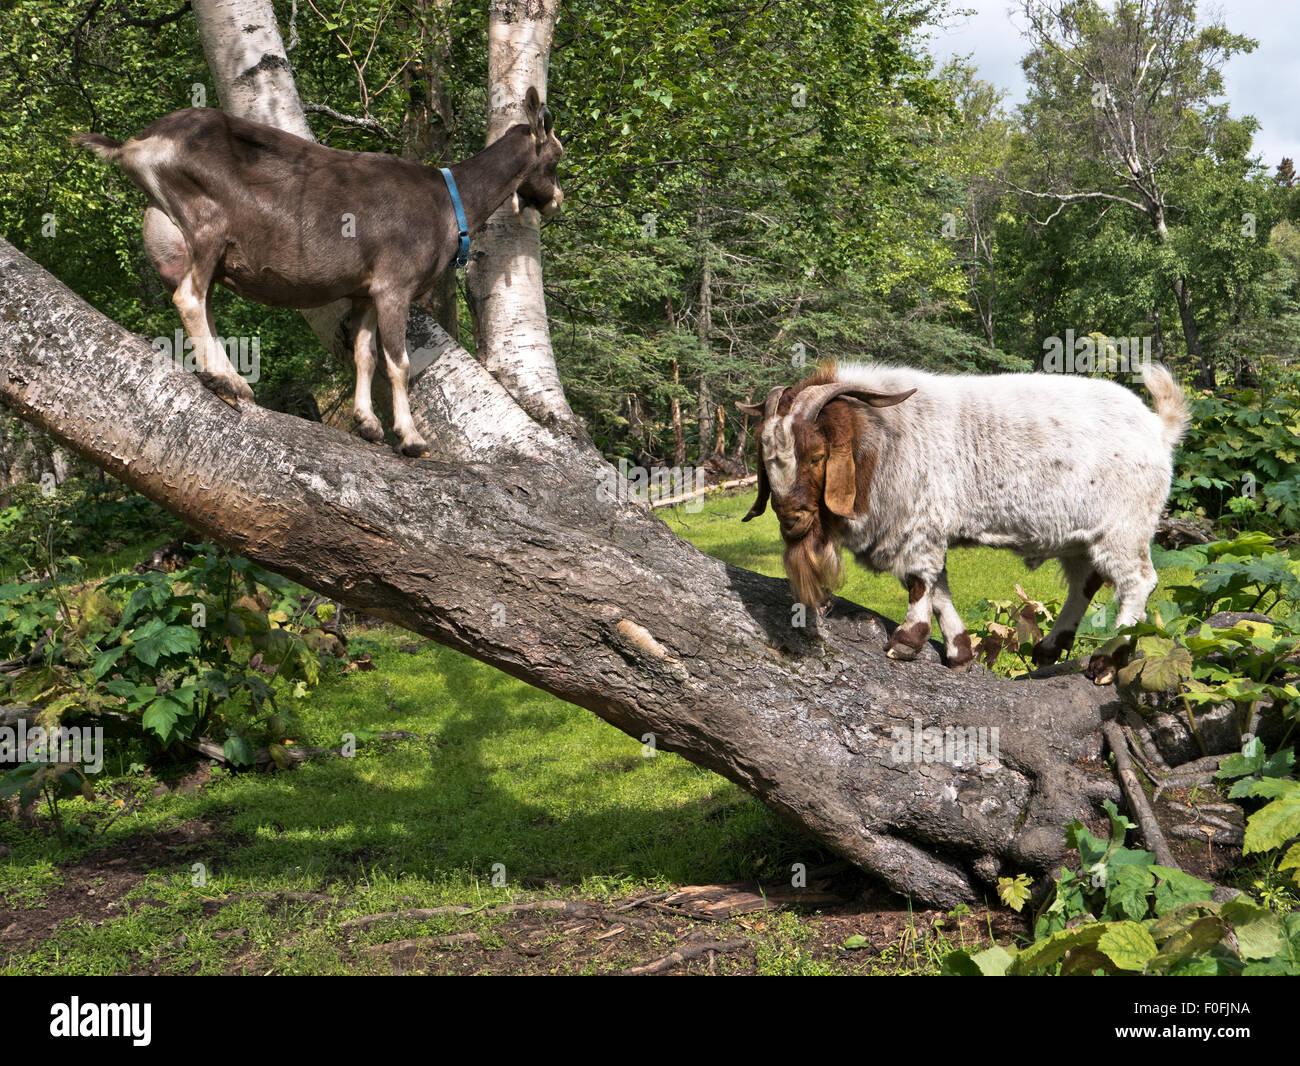 Female & boer goats communicating on leaning birch tree trunk. - Stock Image